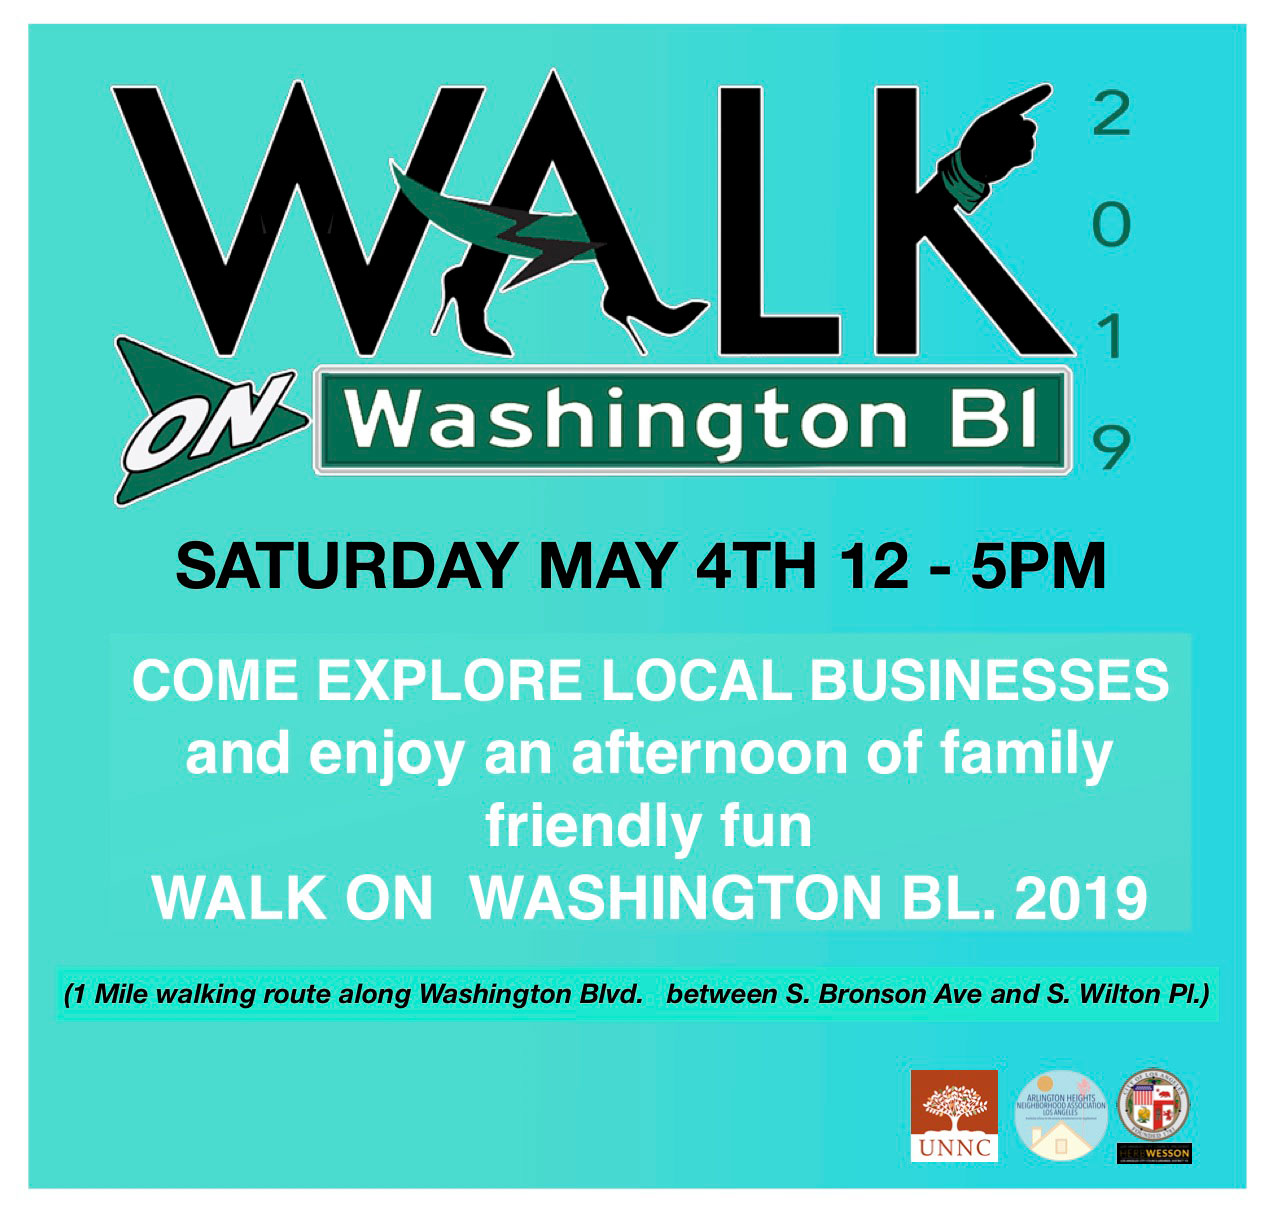 Walk on Washington